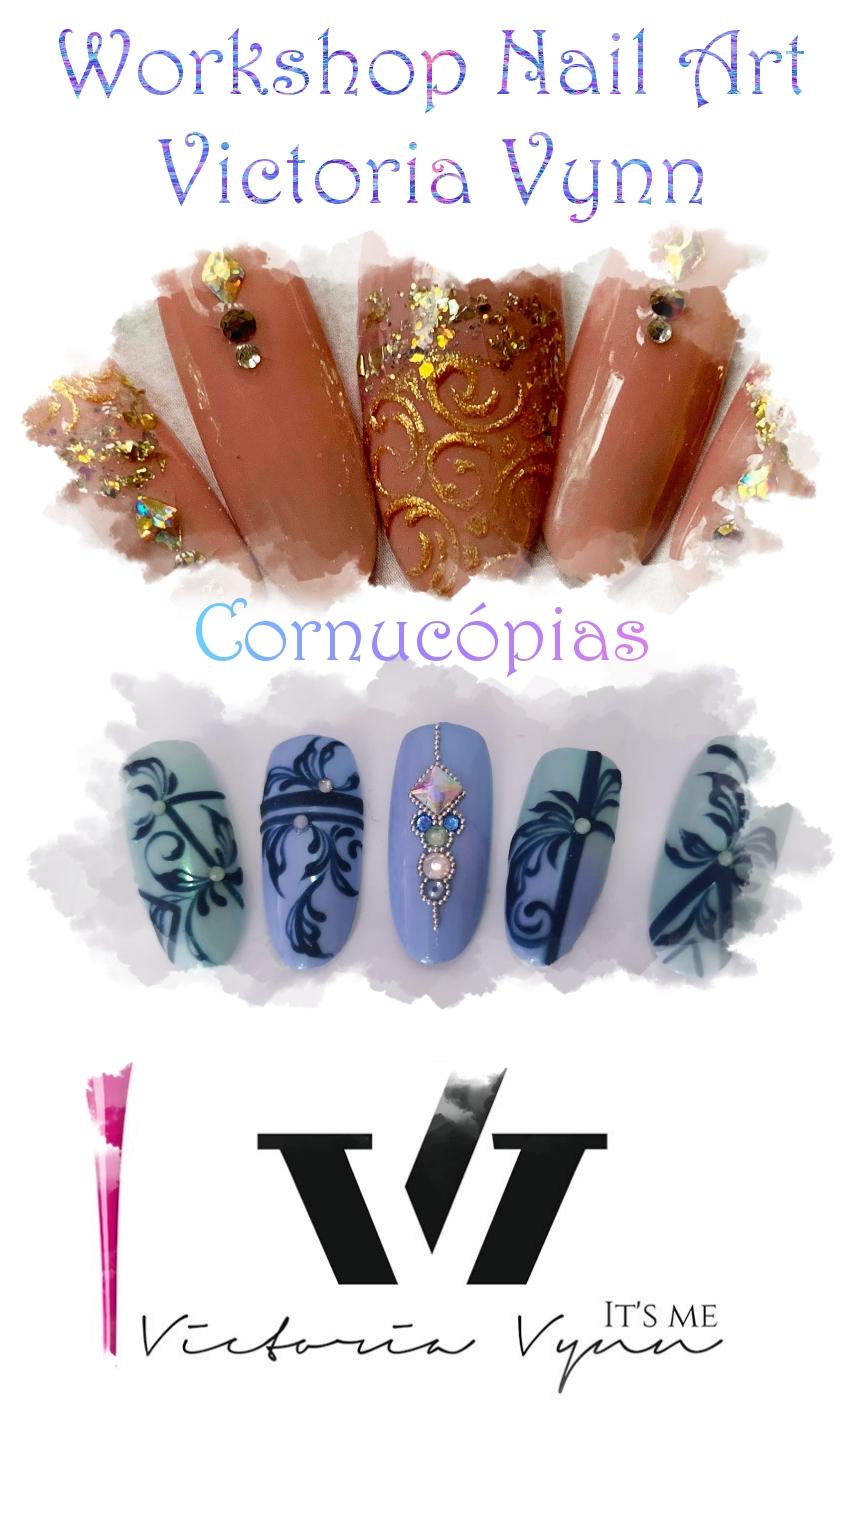 Workshop Nail Art Victoria Vynn